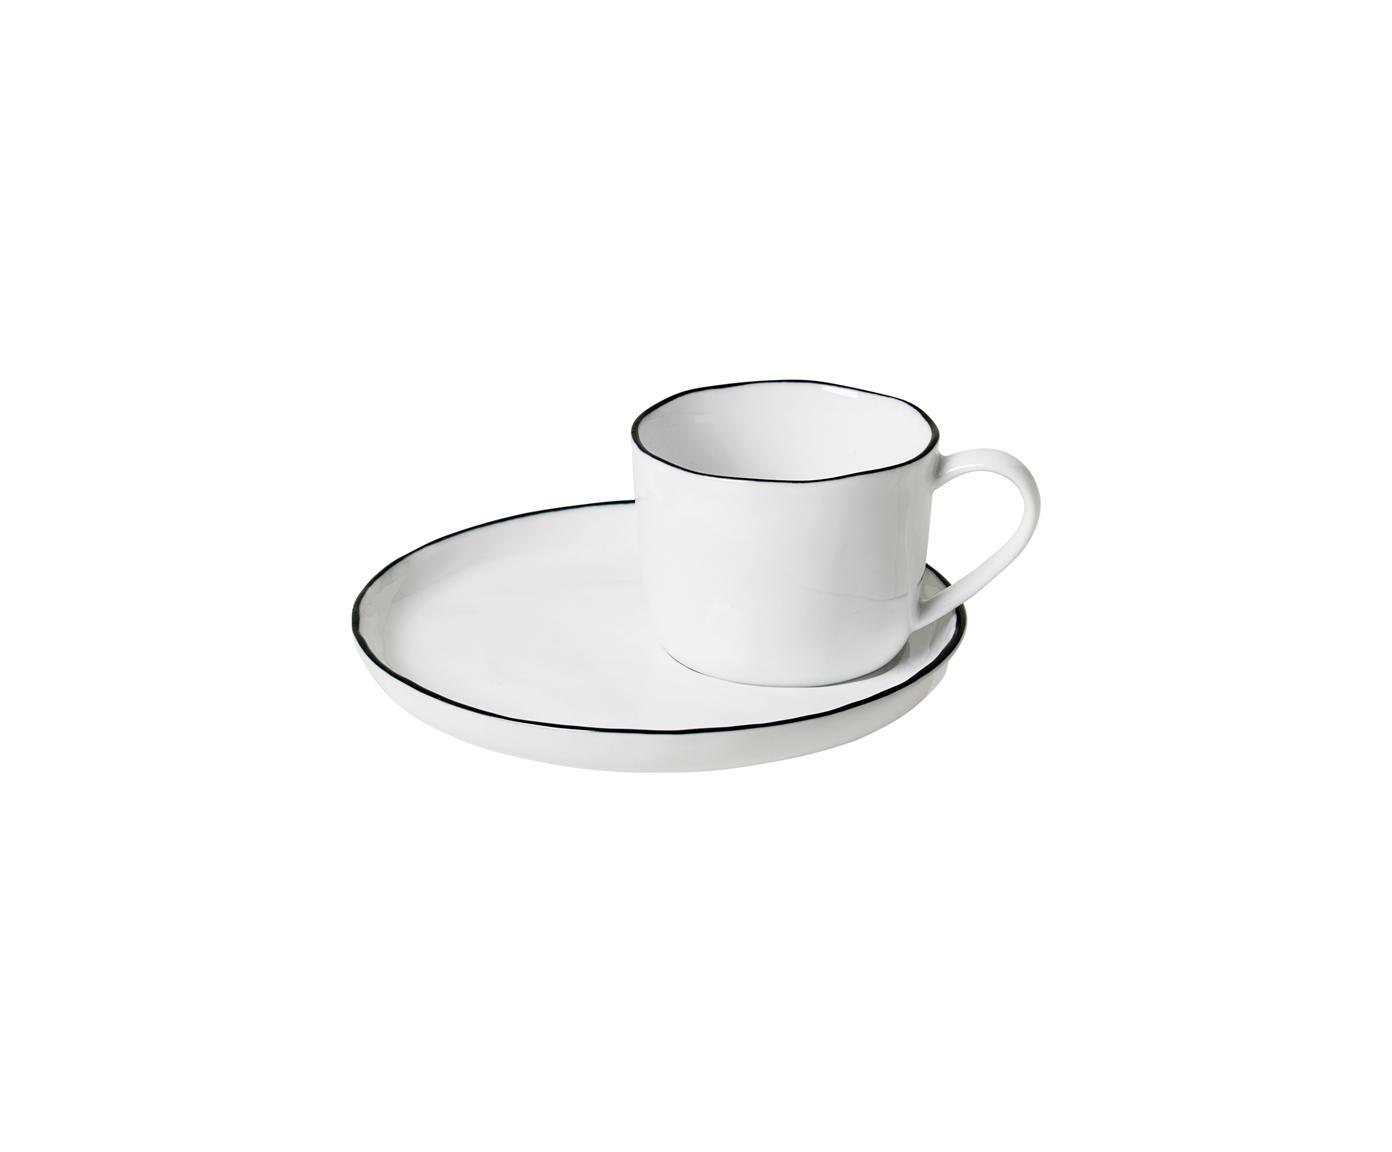 Taza de café artesanal Salt, 2pzas., Porcelana, Blanco crudo Borde: negro, Ø 6 x Al 5 cm